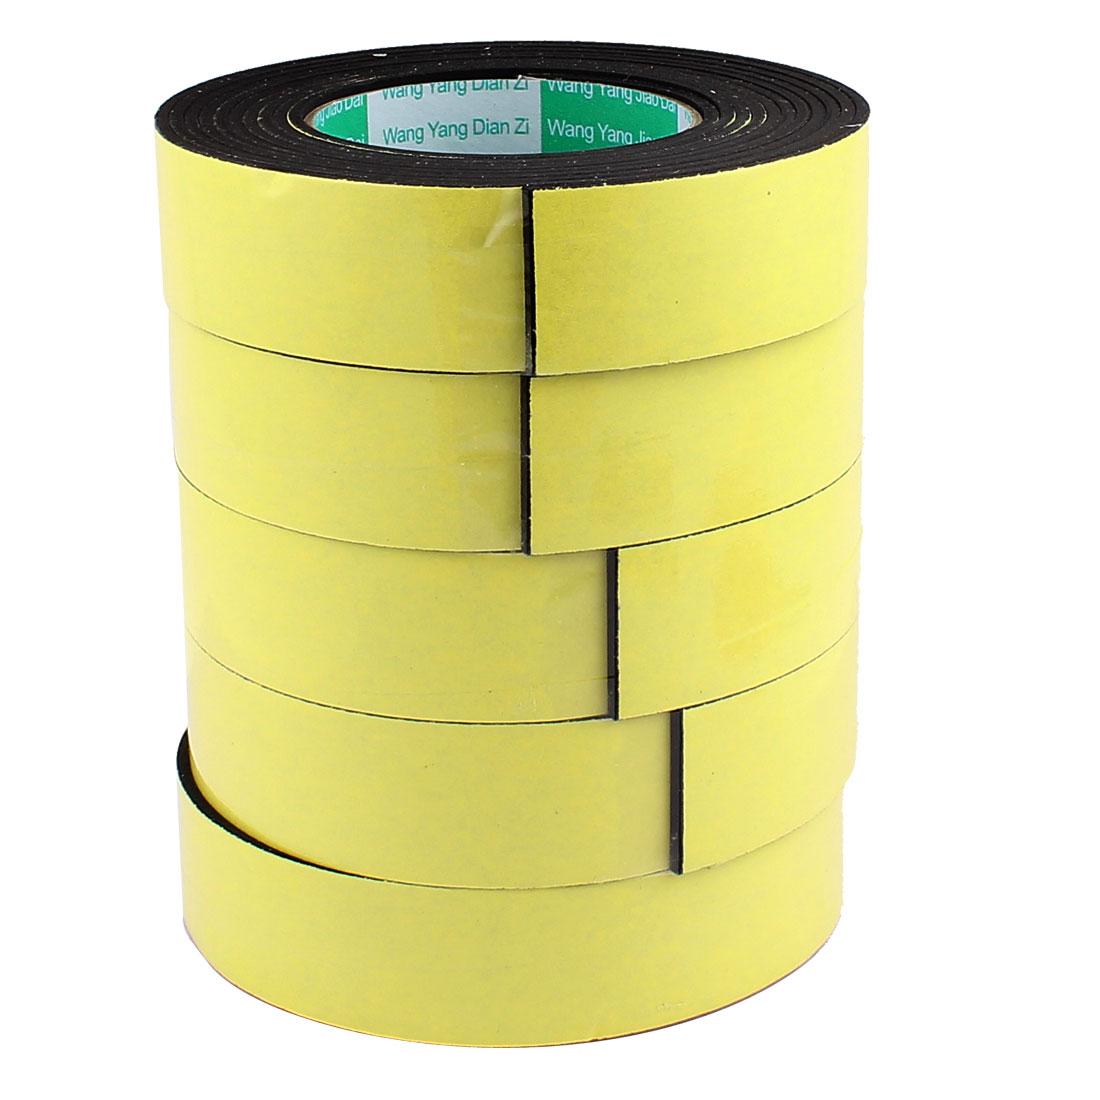 5 Pcs 3.5CM Width 4M Length 3MM Thick Single Sided Sealing Shockproof Sponge Tape